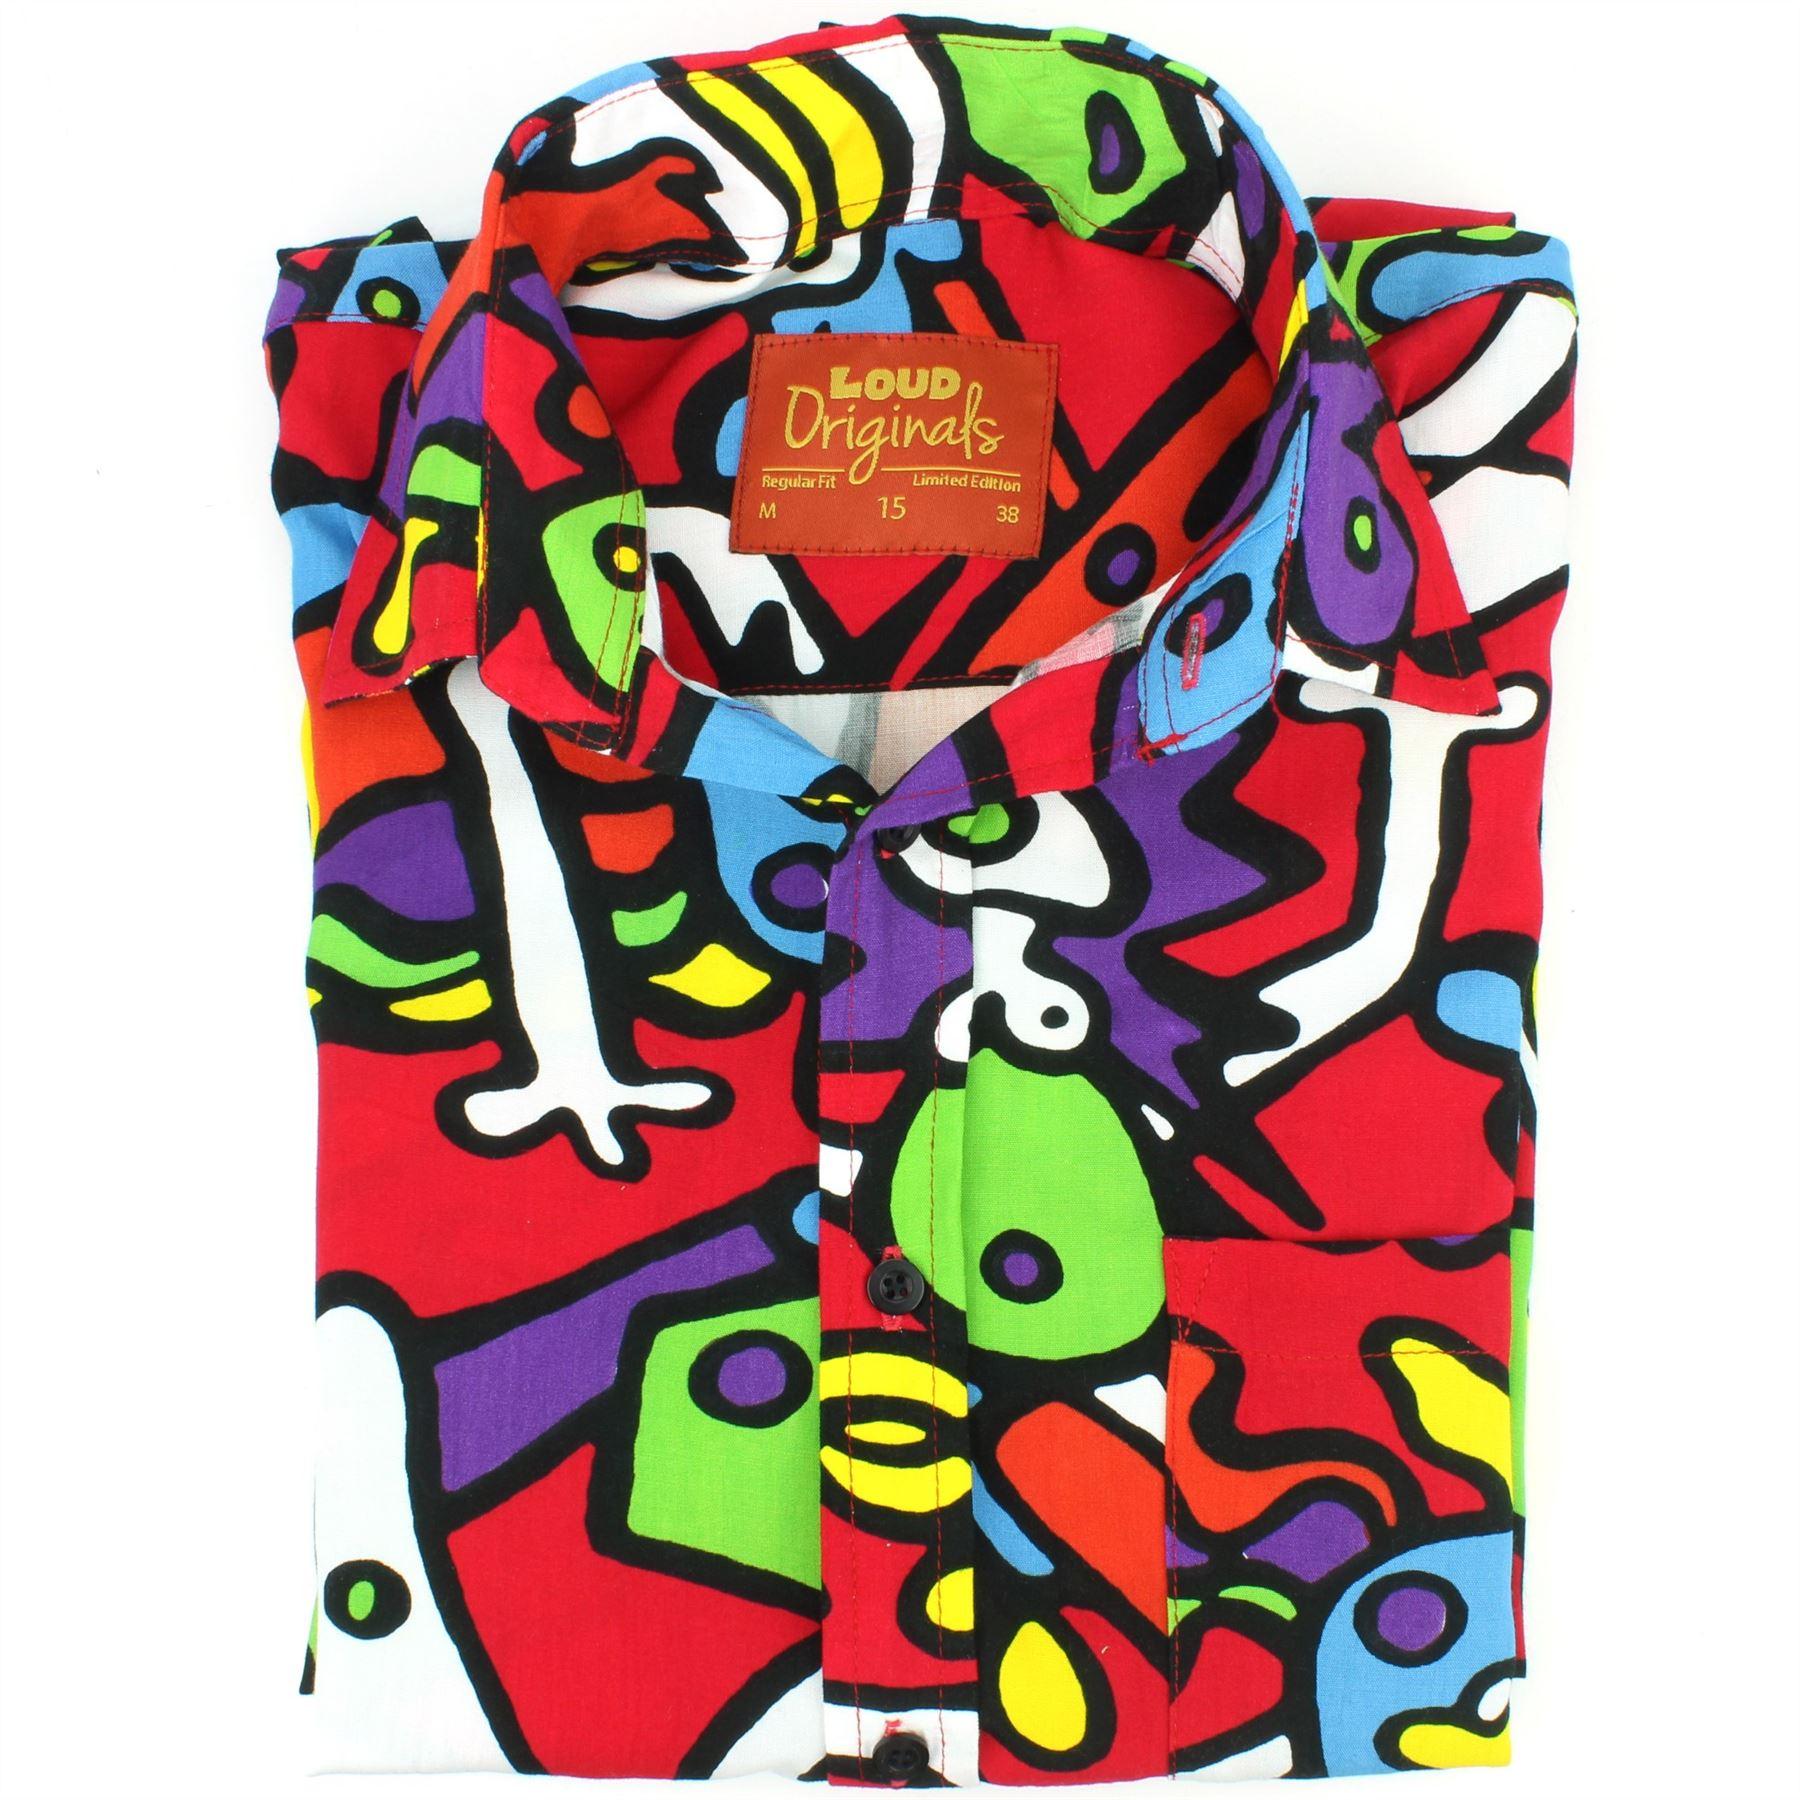 Mens-Shirt-Loud-Originals-Rayon-REGULAR-FIT-Long-Sleeve-TIFFY-PRINT-Retro-Dance thumbnail 16